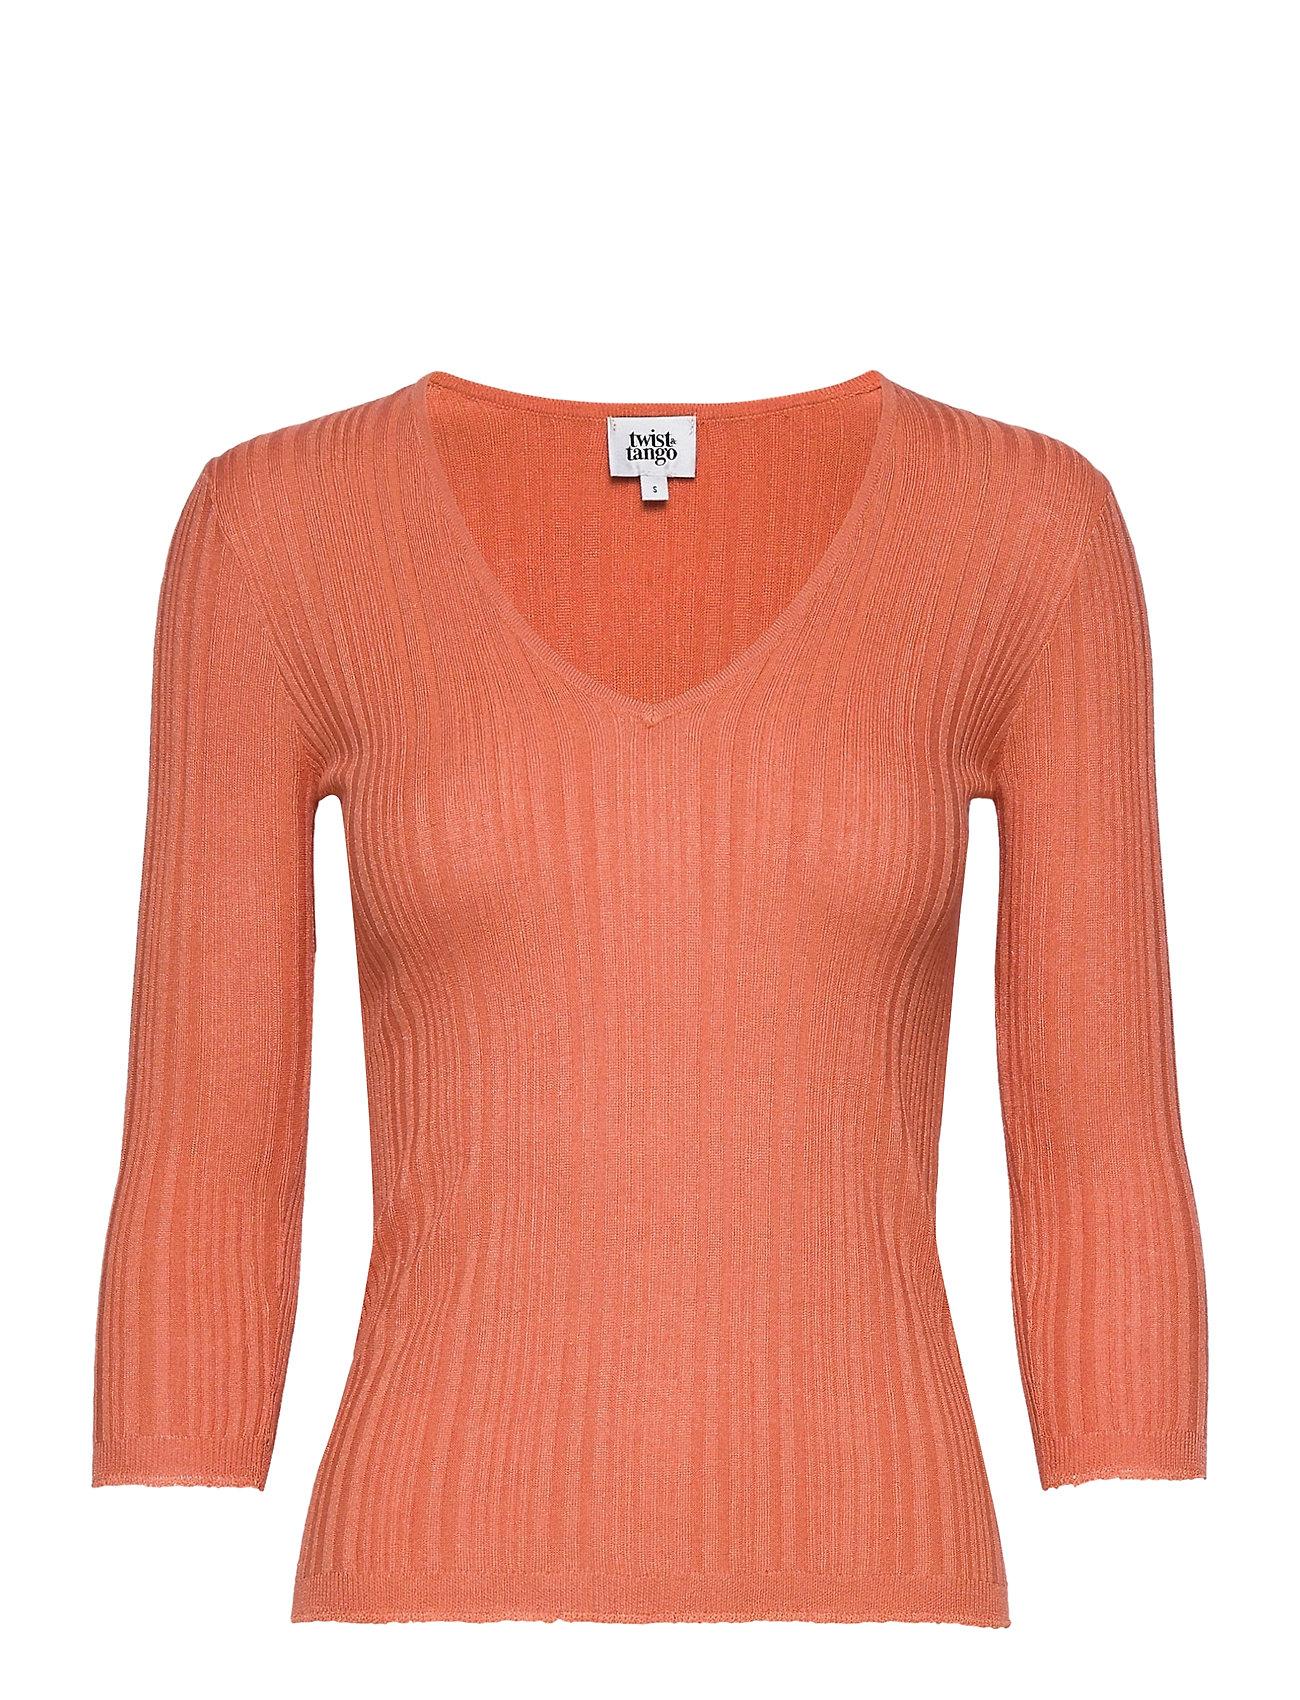 Image of Sabina Knitted Tee T-Shirts & Tops Knitted T-Skjorte/tops Orange Twist & Tango (3440209107)